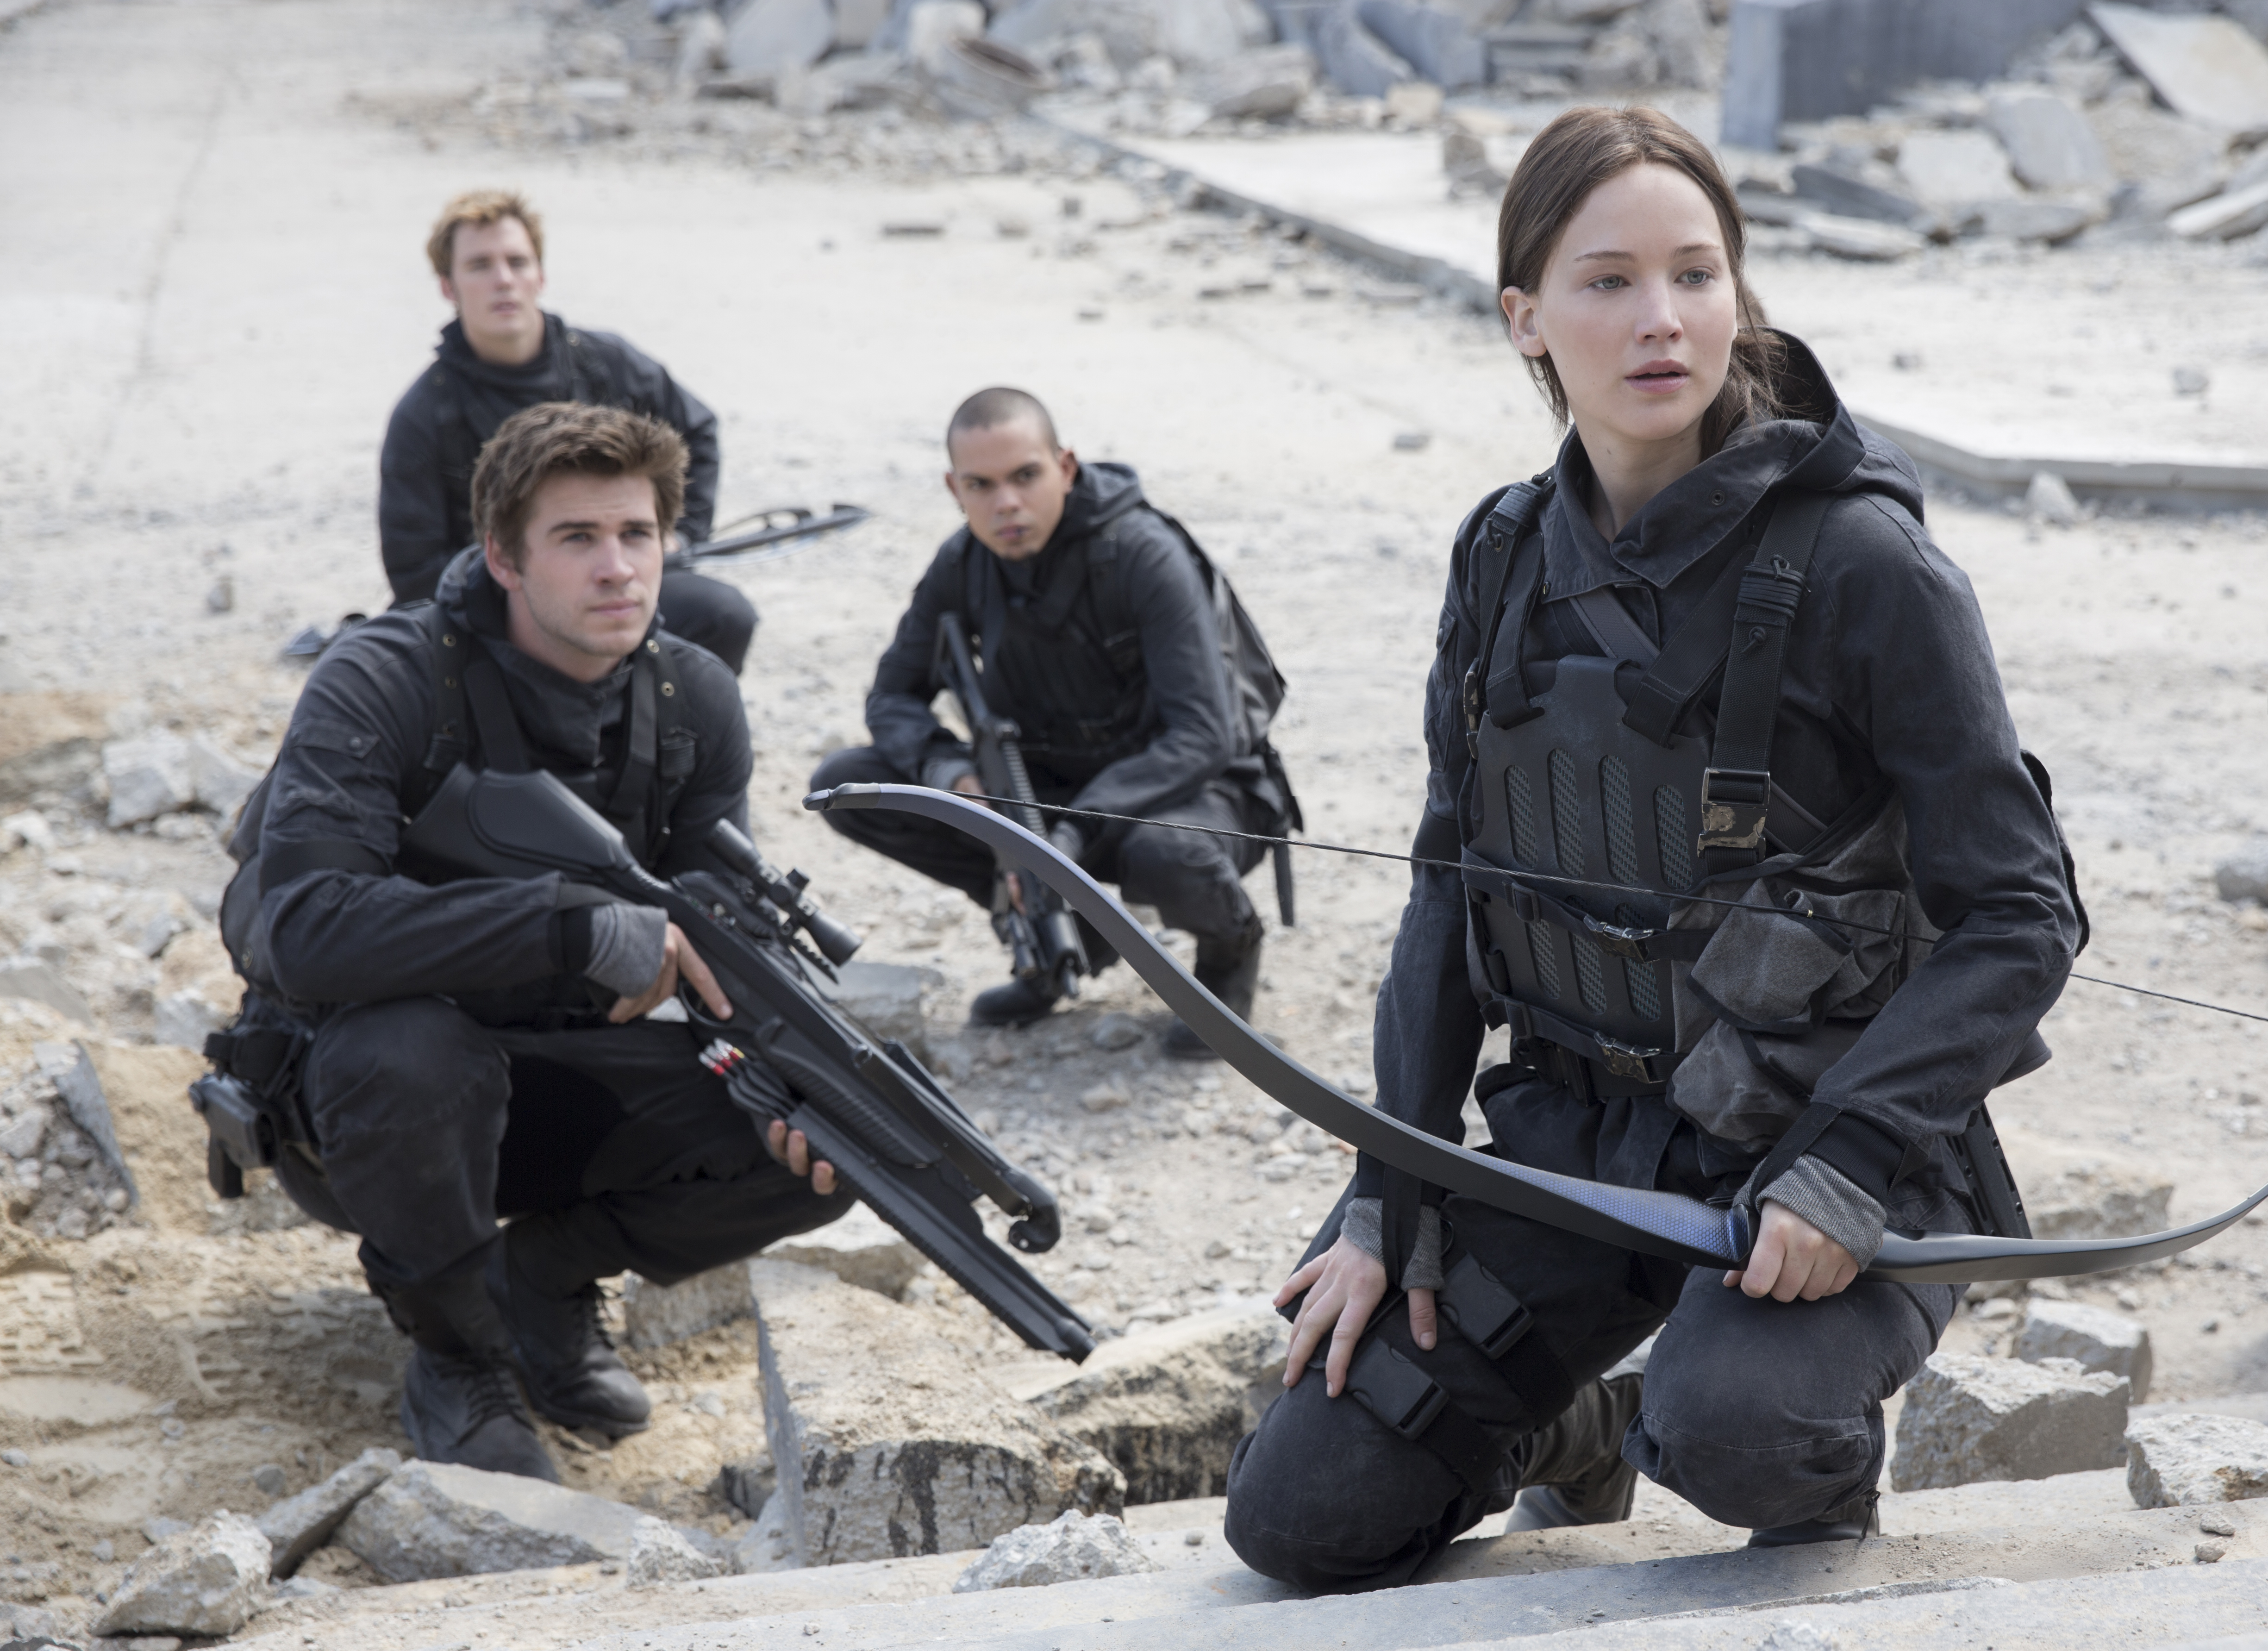 The Hunger Games: Mockingjay - Part 2; image via Lionsgate